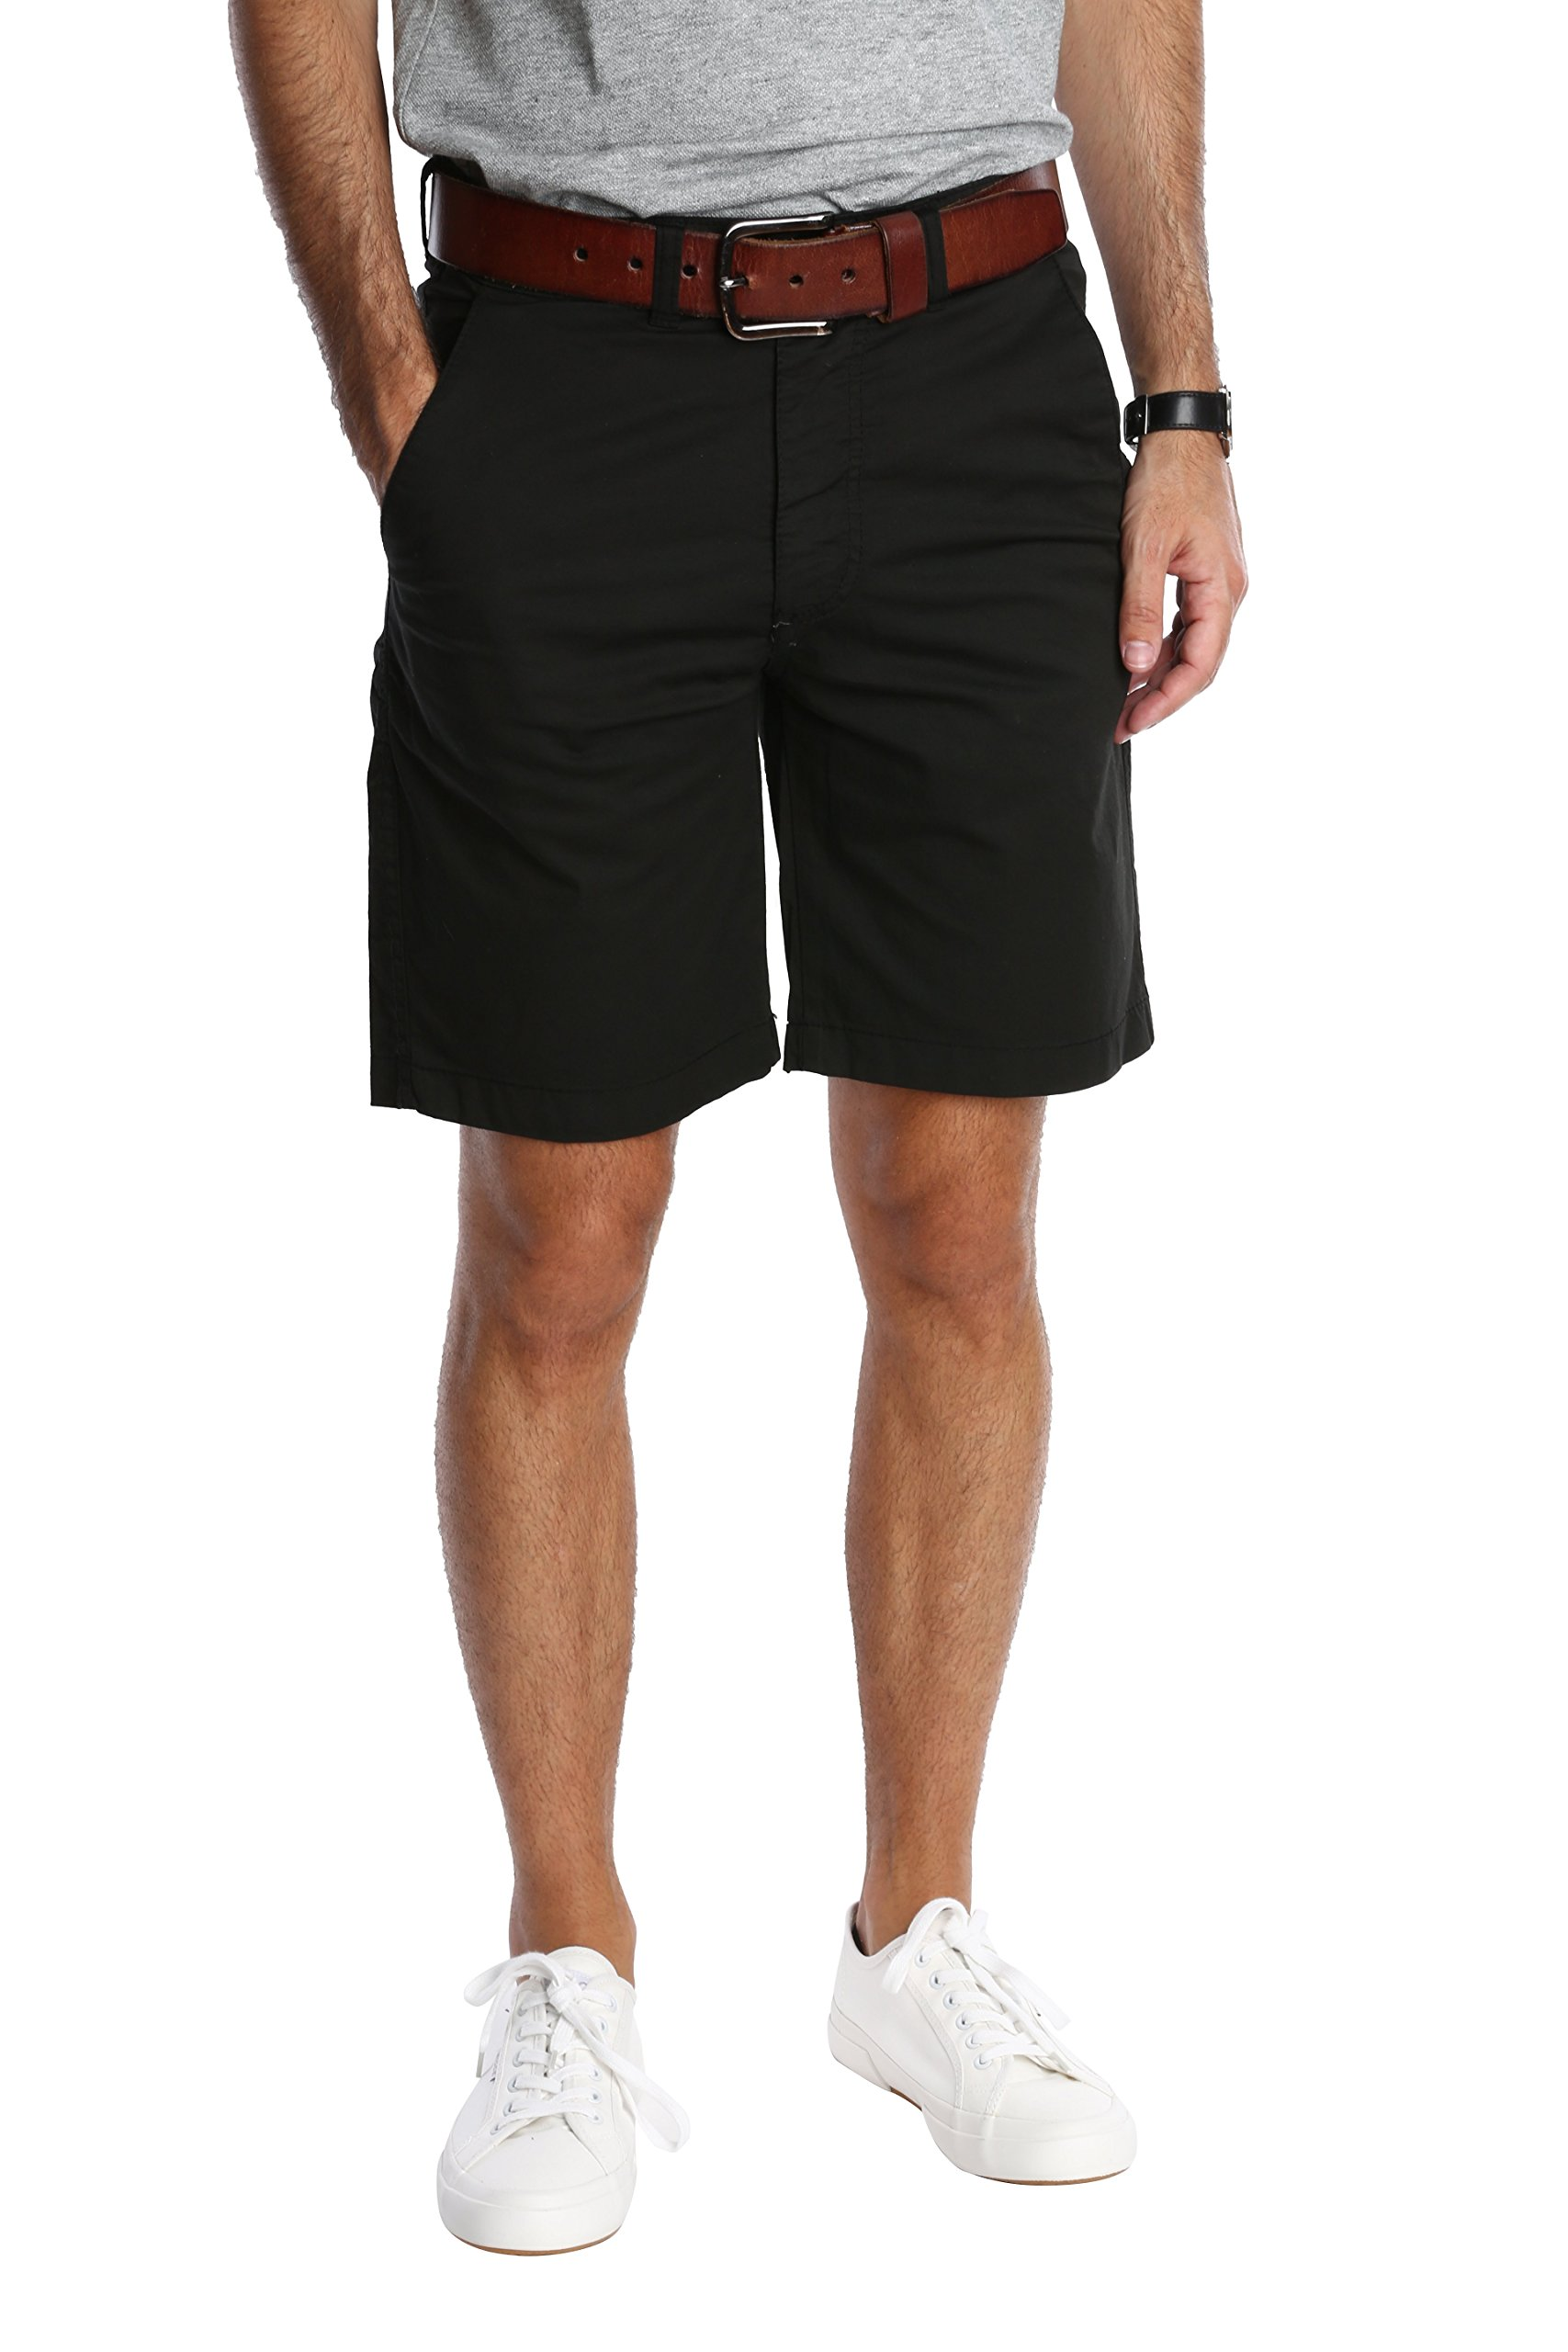 Pembrook Men's Casual Shorts n Shorts - 34 Black - Flat Front Classic Fit by Pembrook